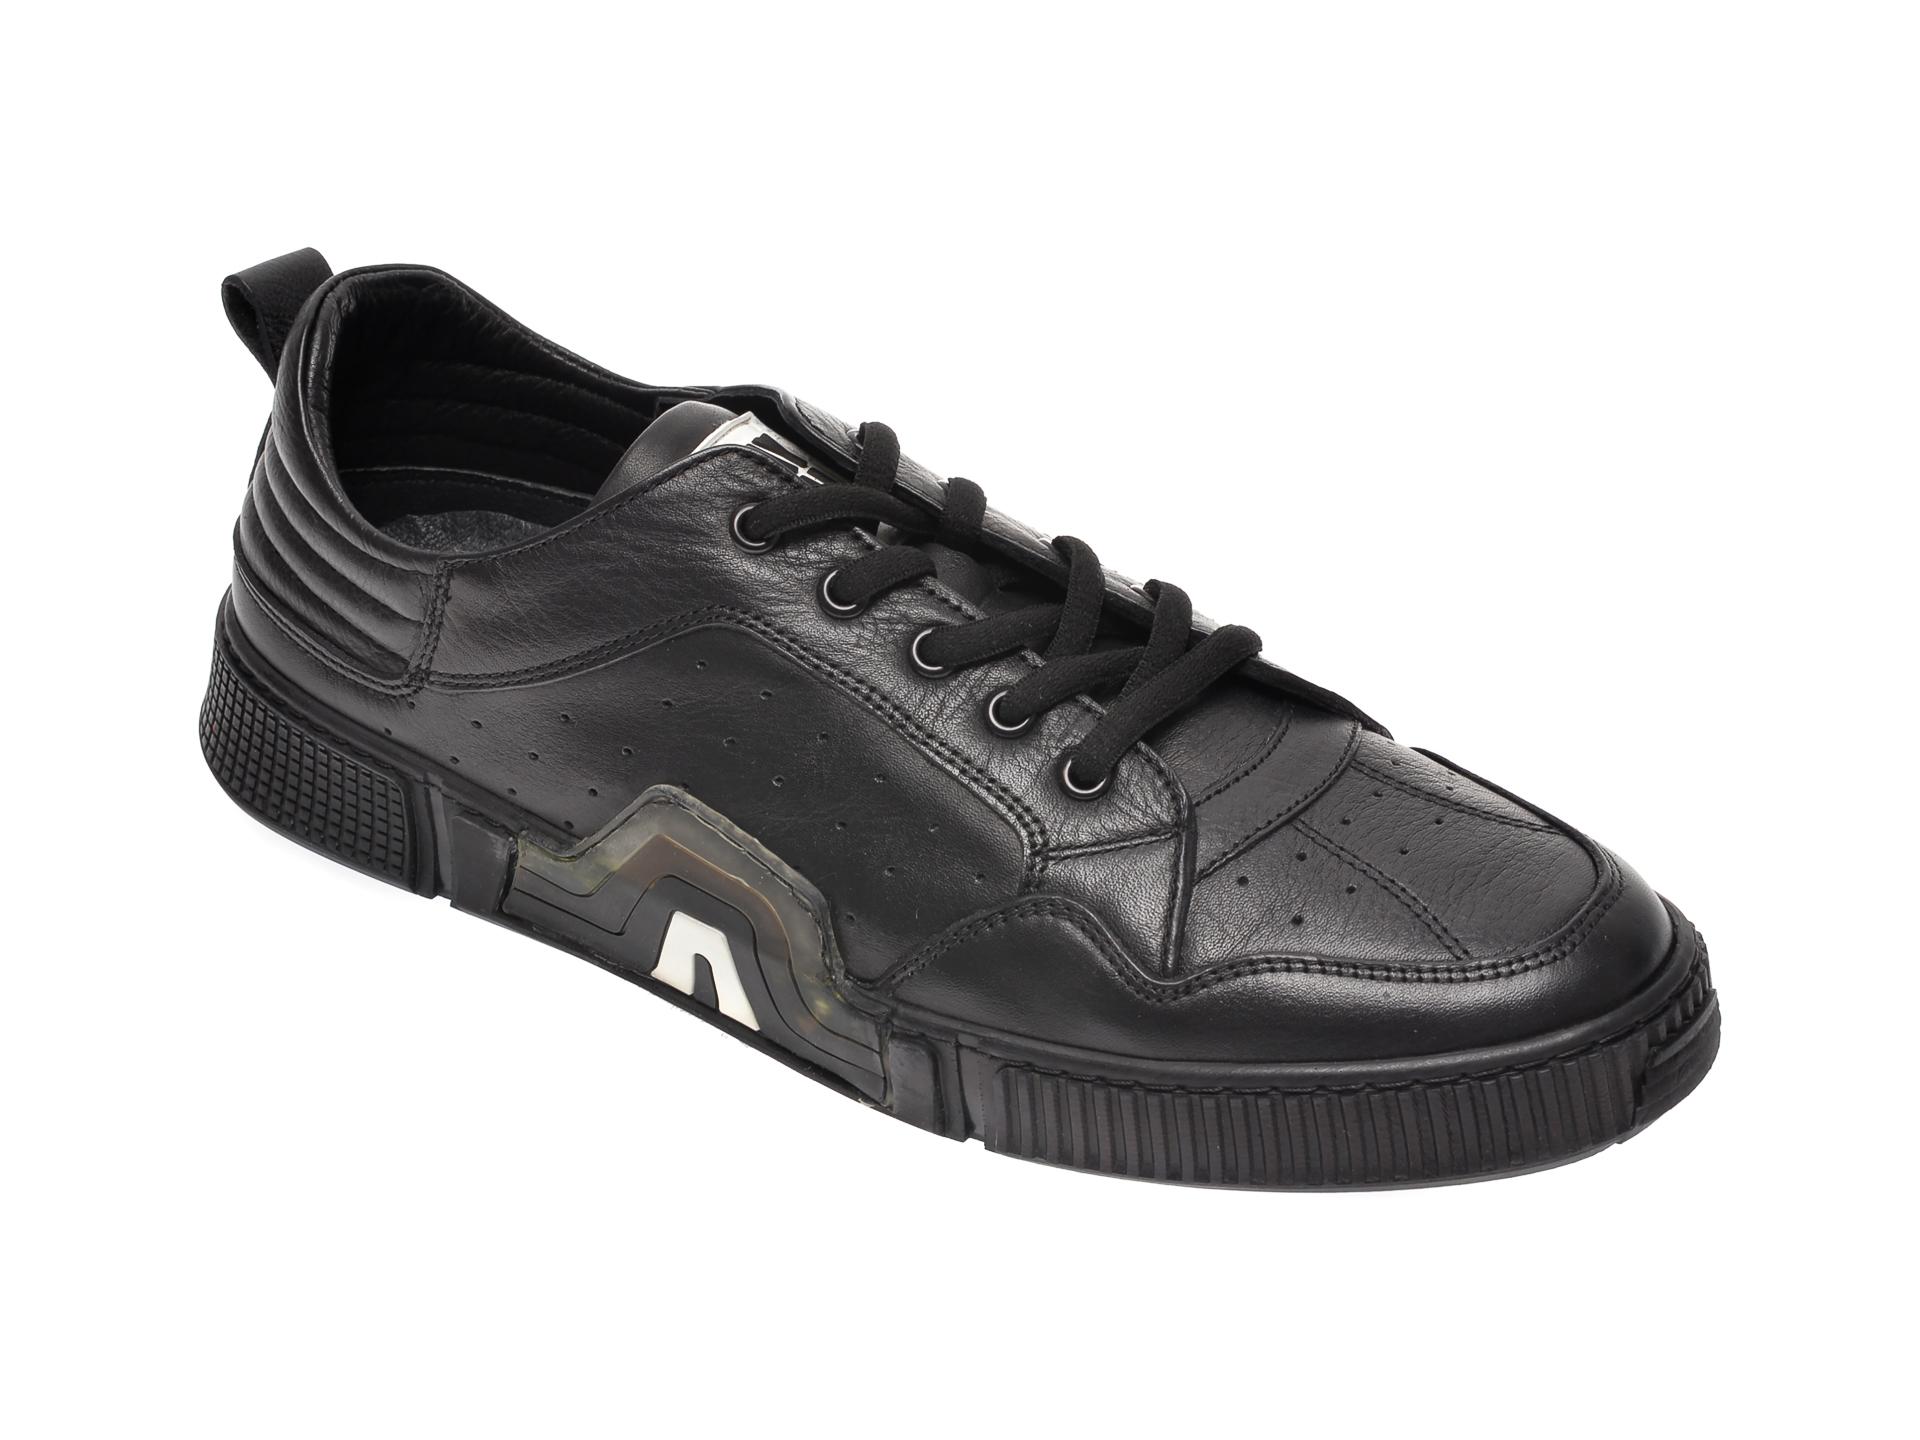 Pantofi OTTER negri, 72404, din piele naturala